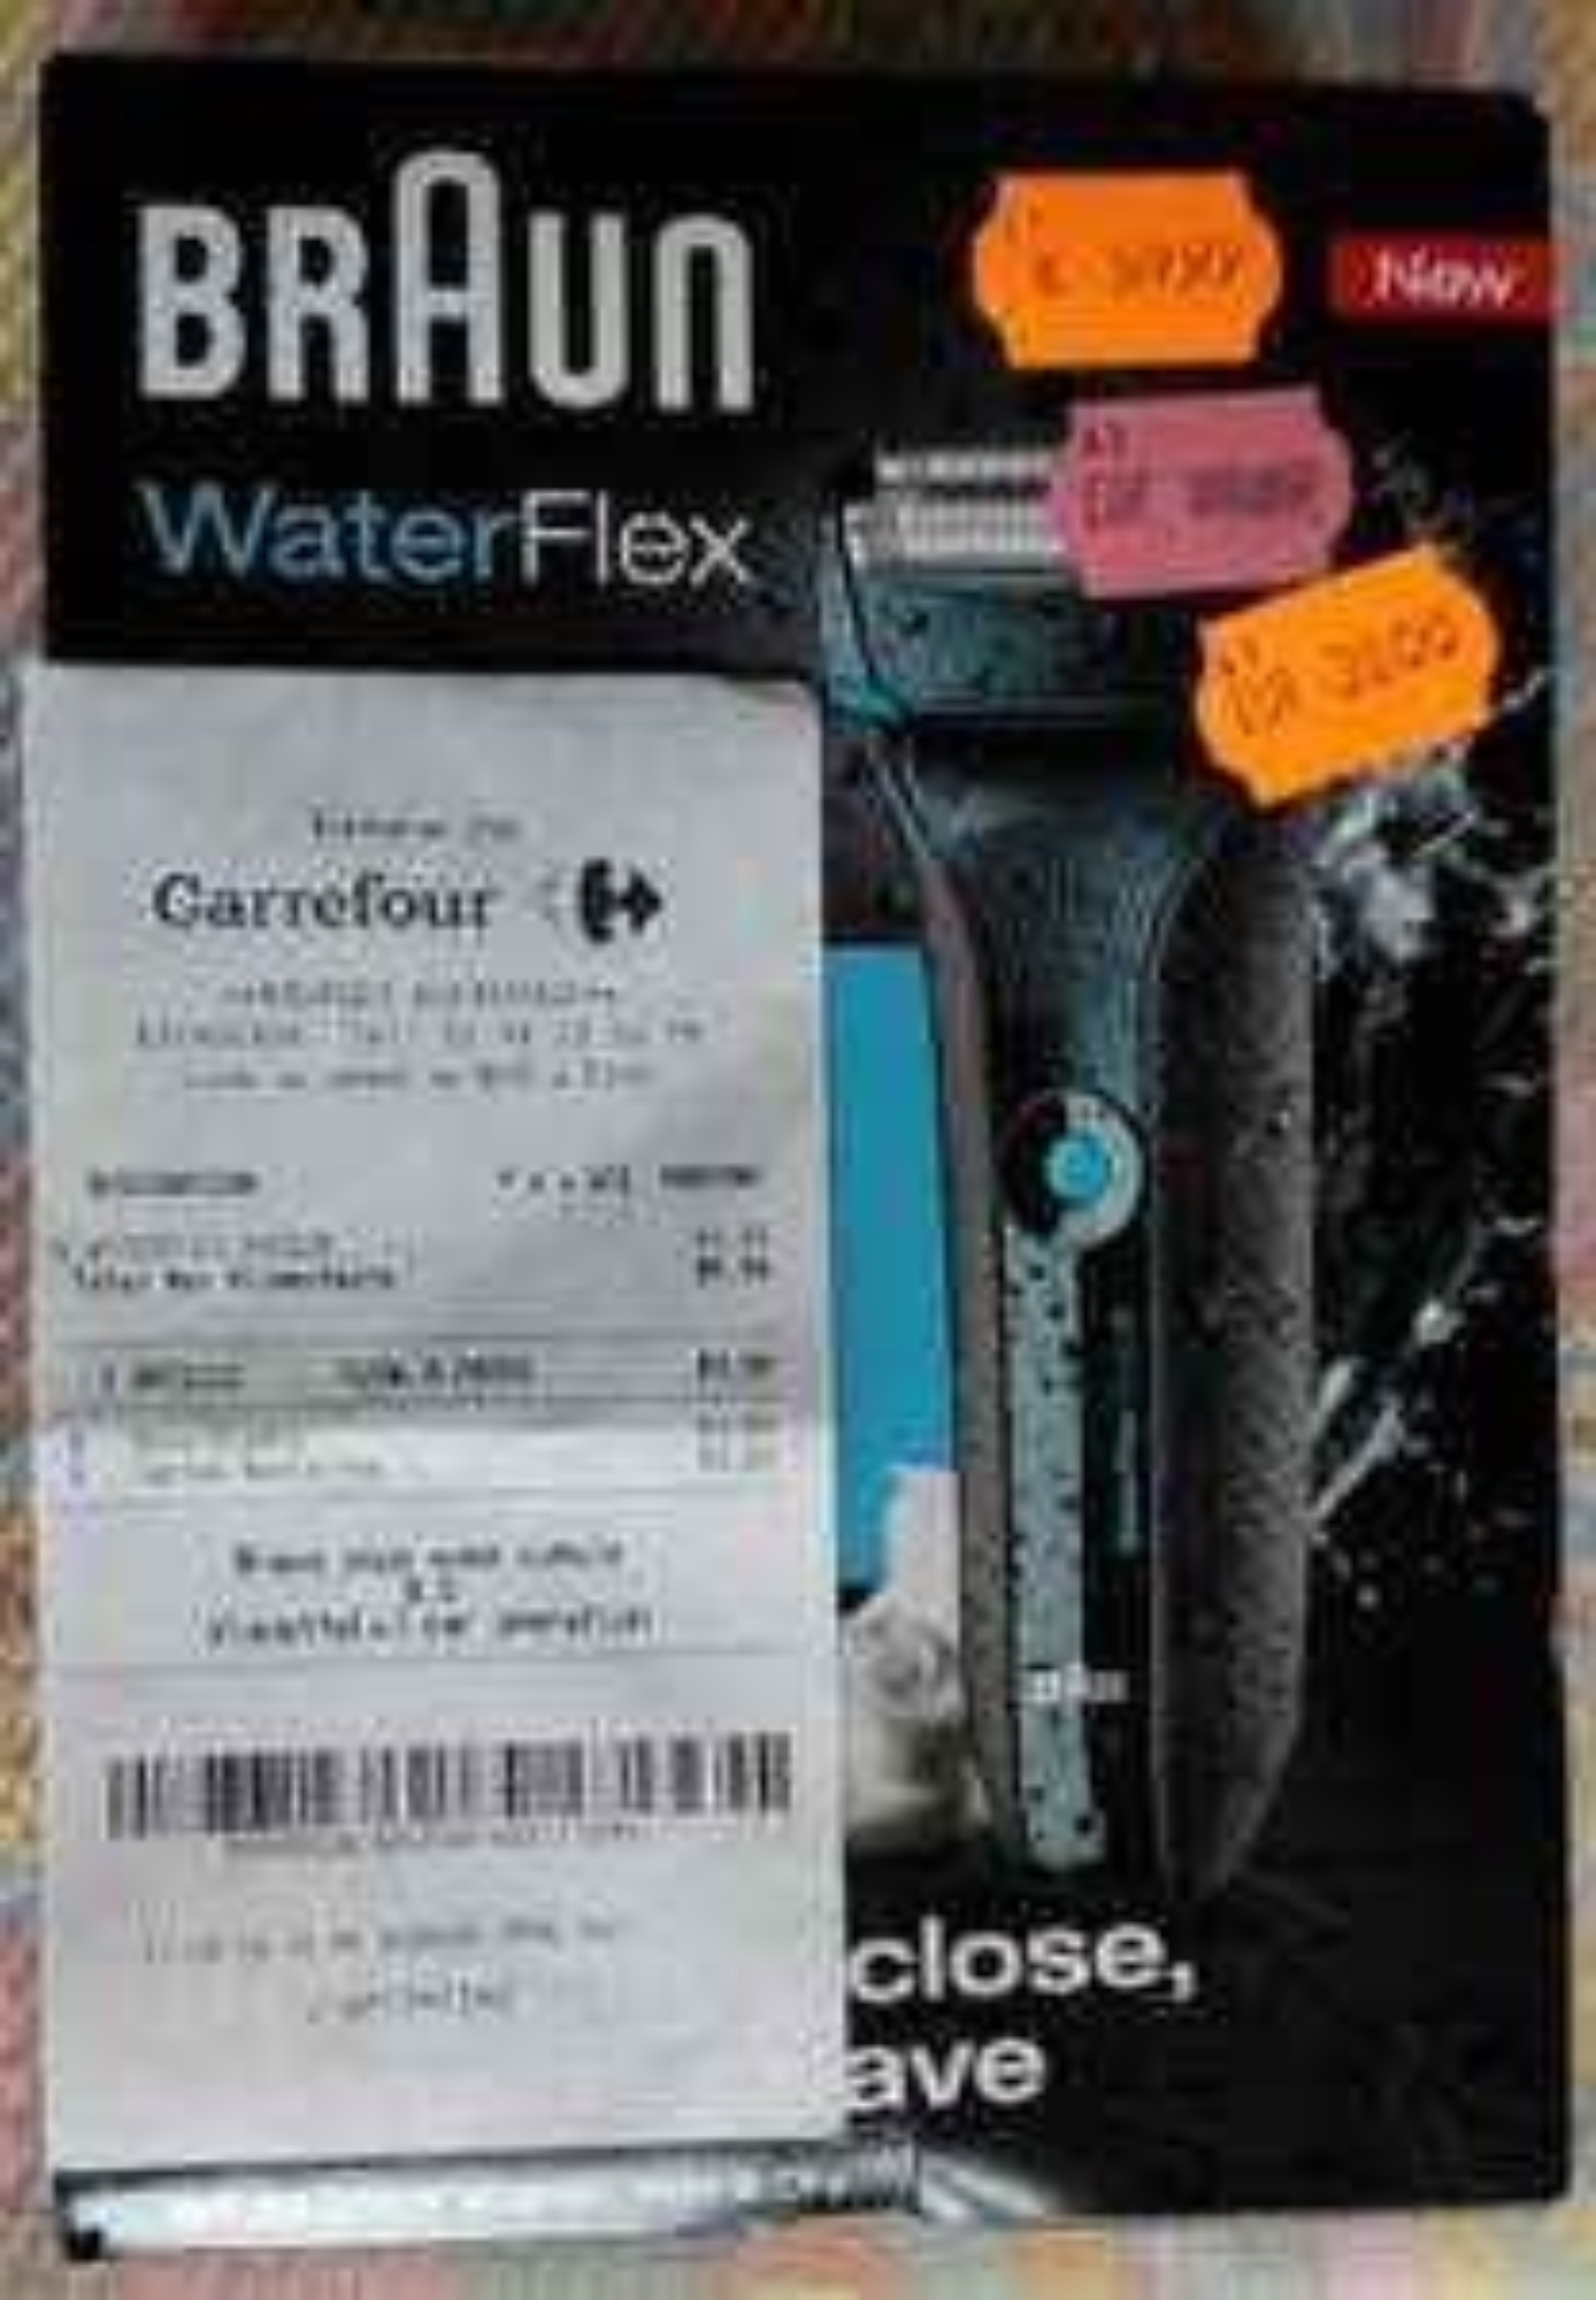 Rasoir électrique Braun WaterFlex WF2S